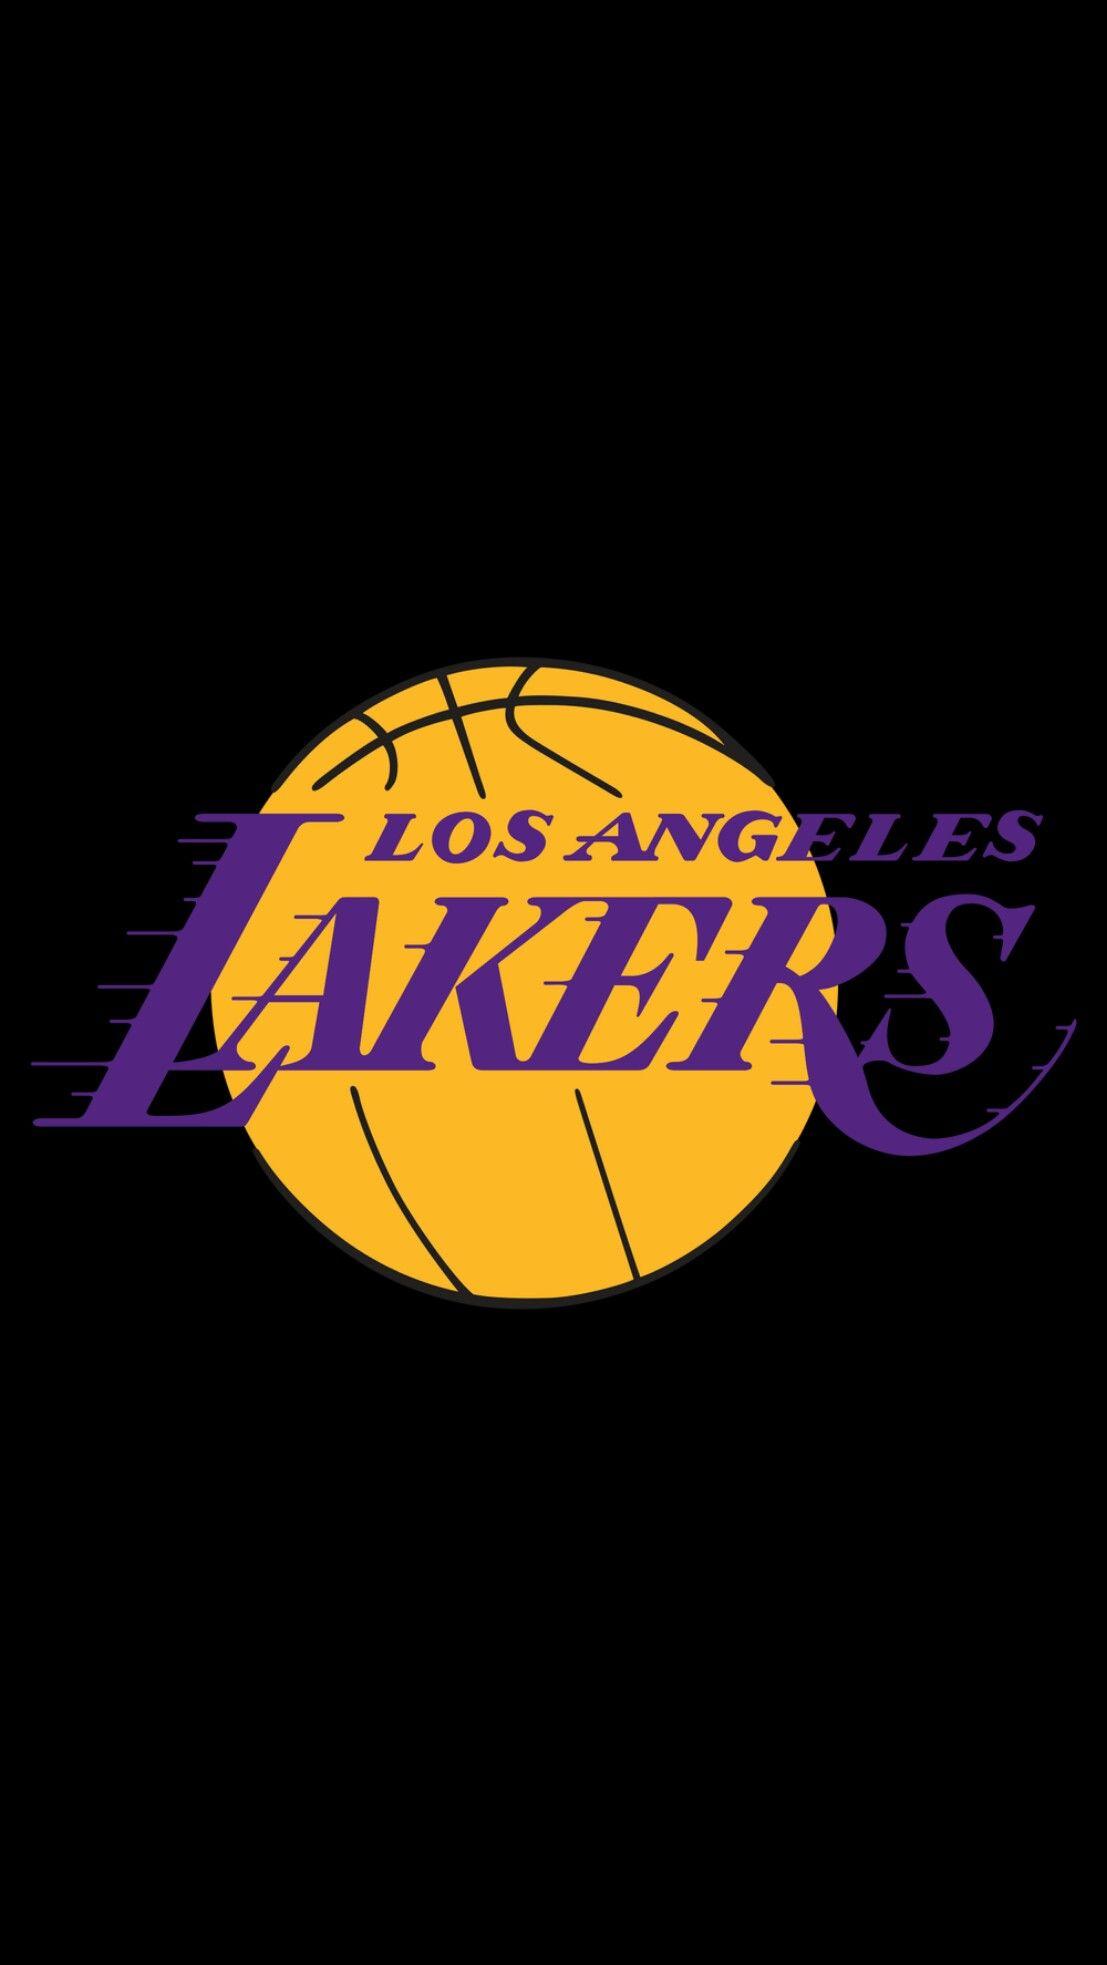 Nba Wallpaper Iphone Android Lakers Logo Lakers Wallpaper Nba Wallpapers